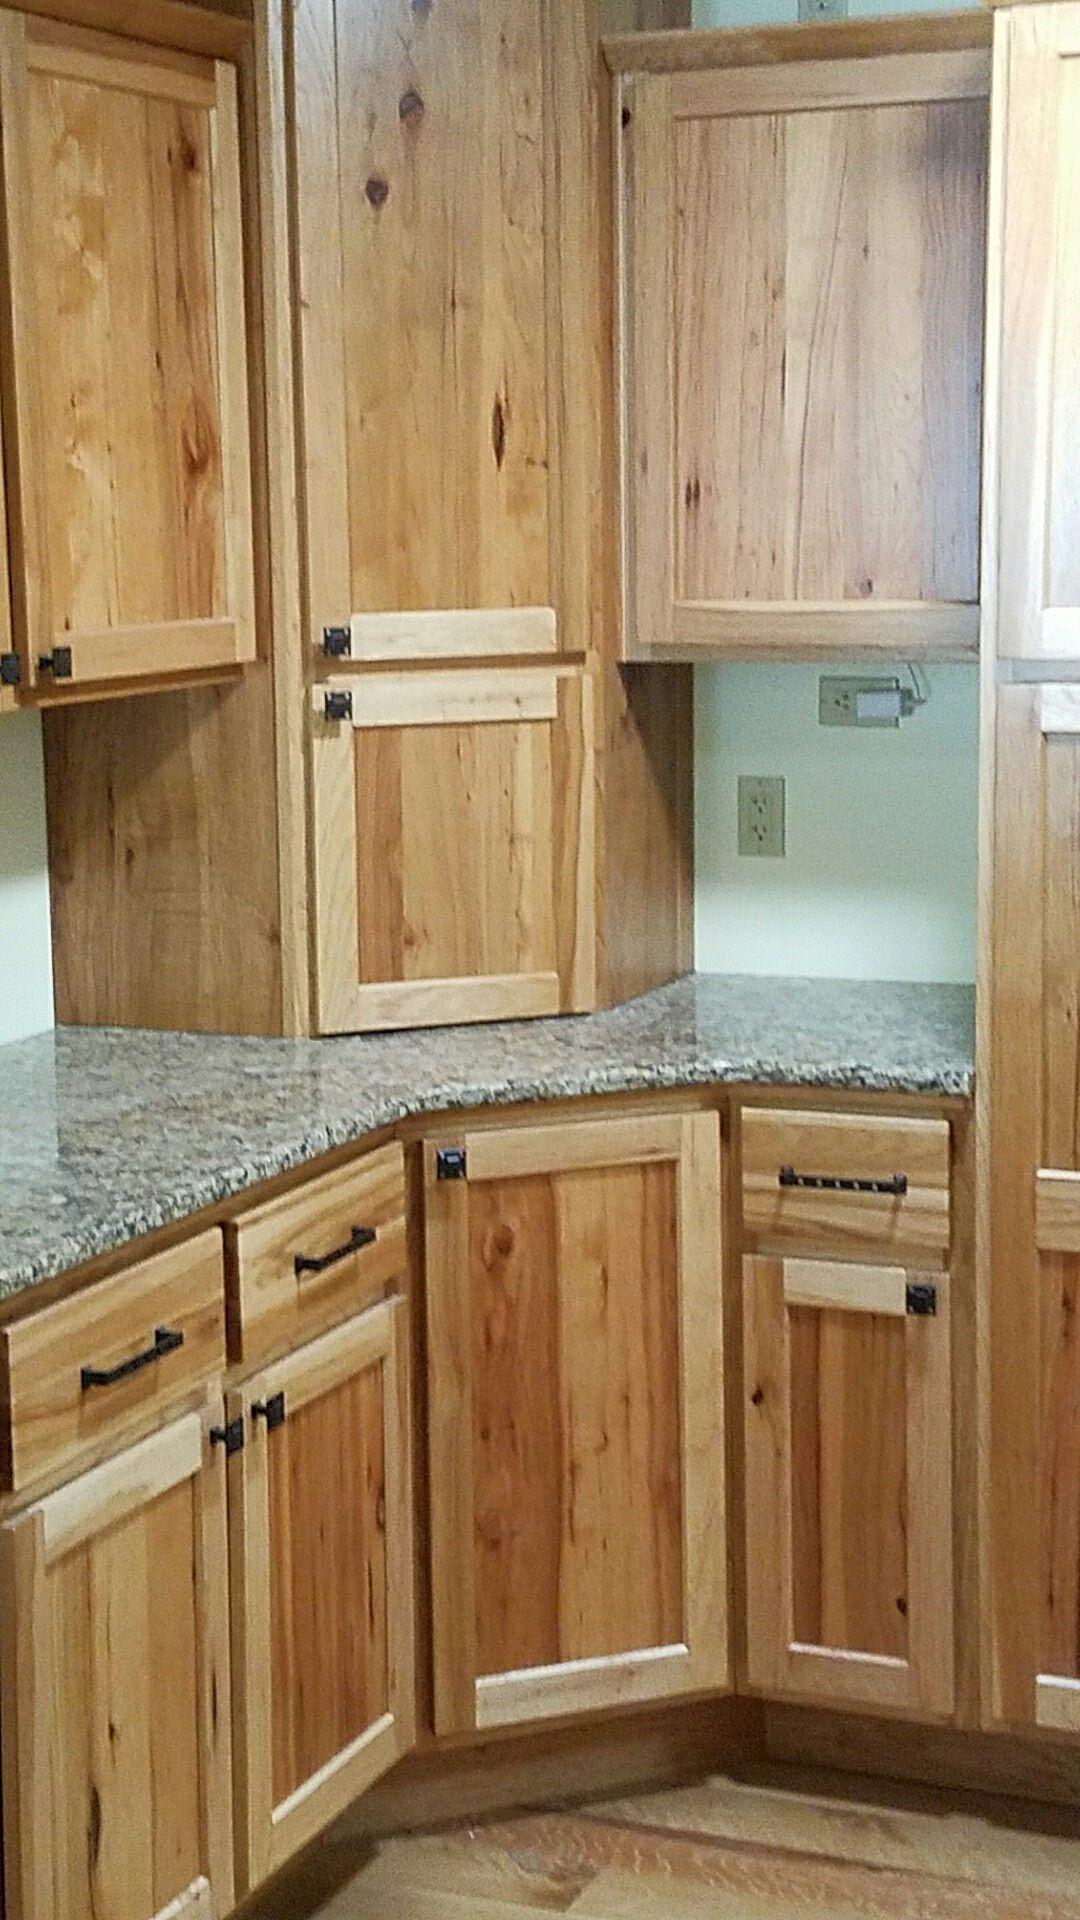 Best Custom Hickory Cabinets And Cambria Quartz Countertops 400 x 300